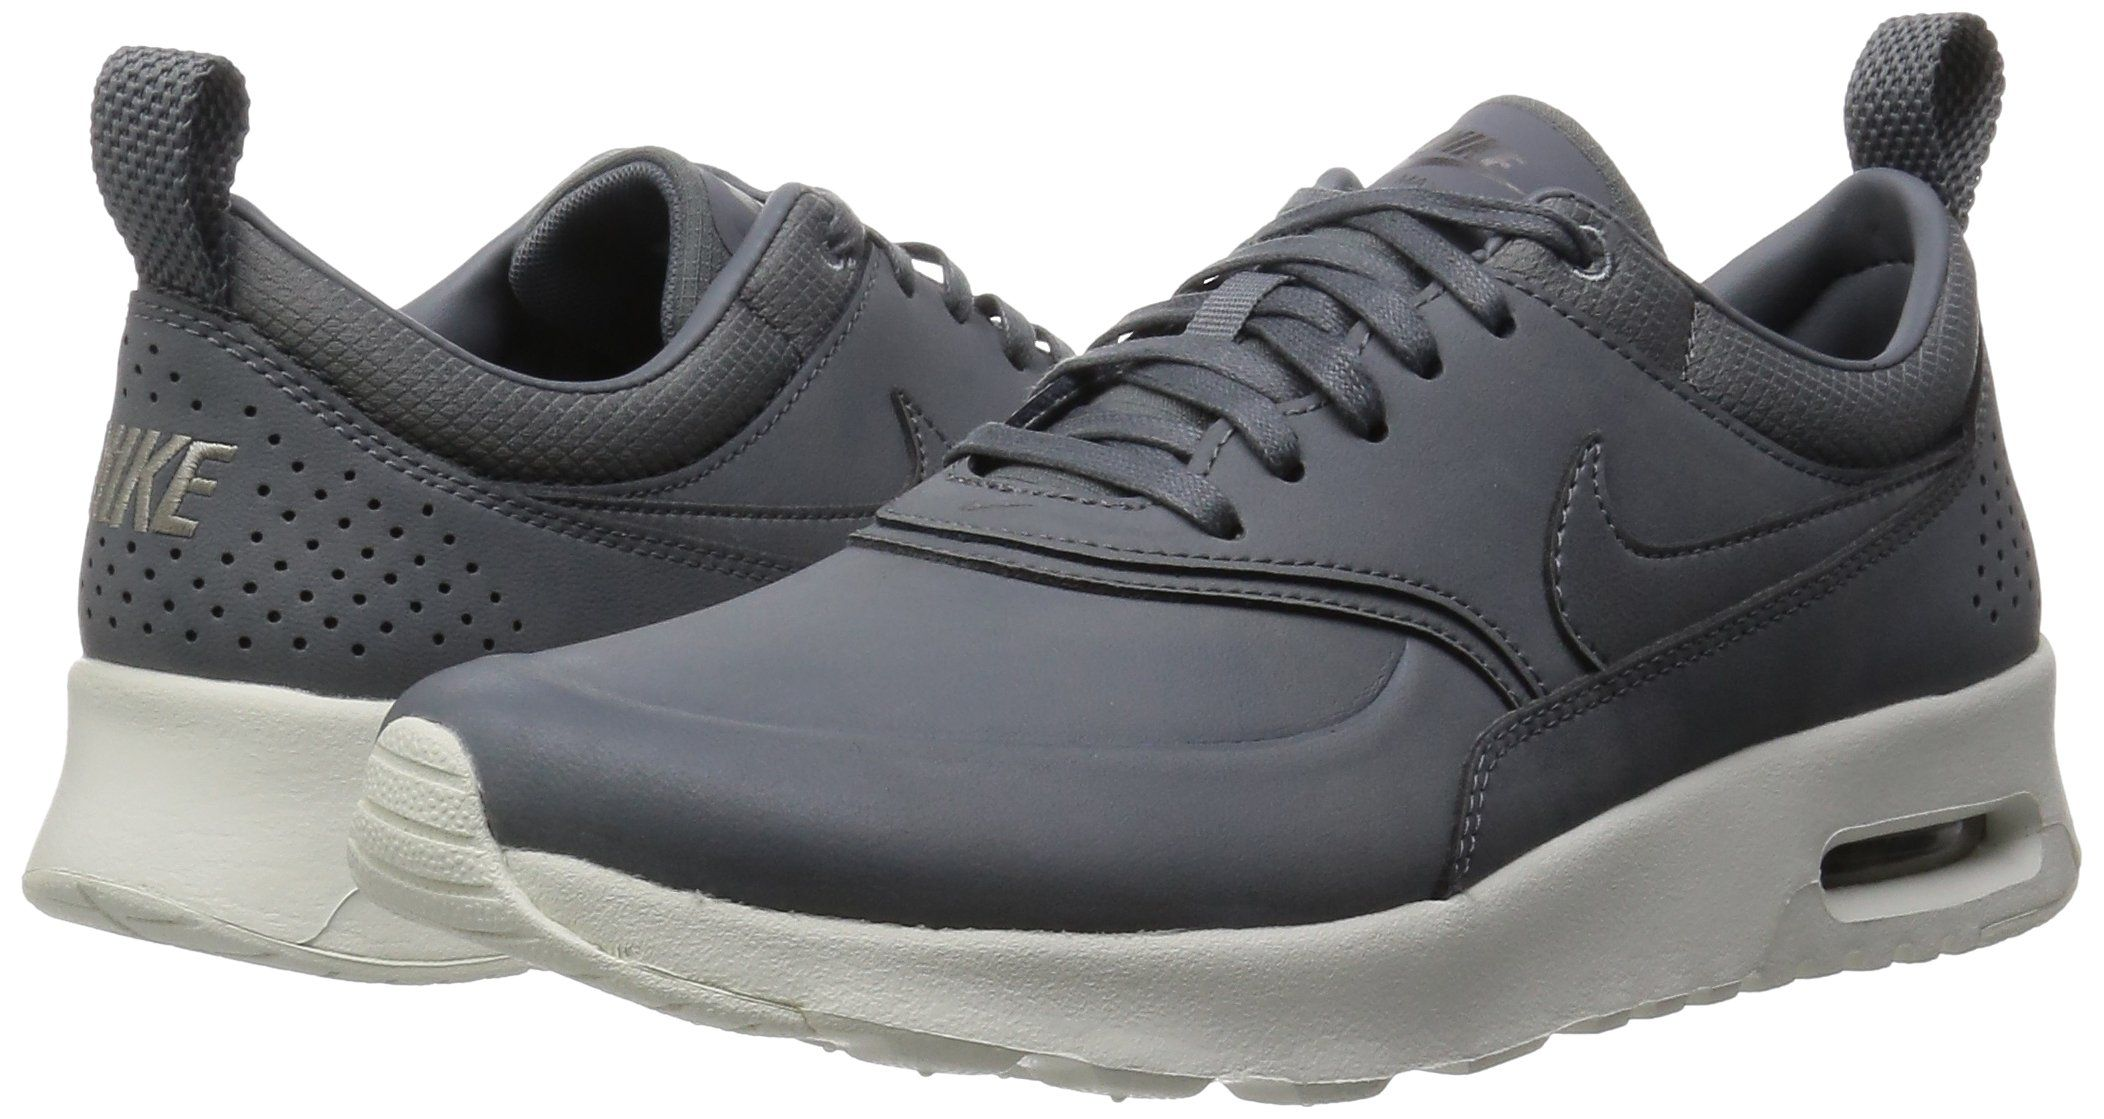 buy online 73aad dc593 Nike Air Max Thea Premium, Damen Sneakers, Grau (Cool GreyCool  Grey-Sail-Metalic Pwtr), 39 EU Amazon.de Schuhe  Handtaschen